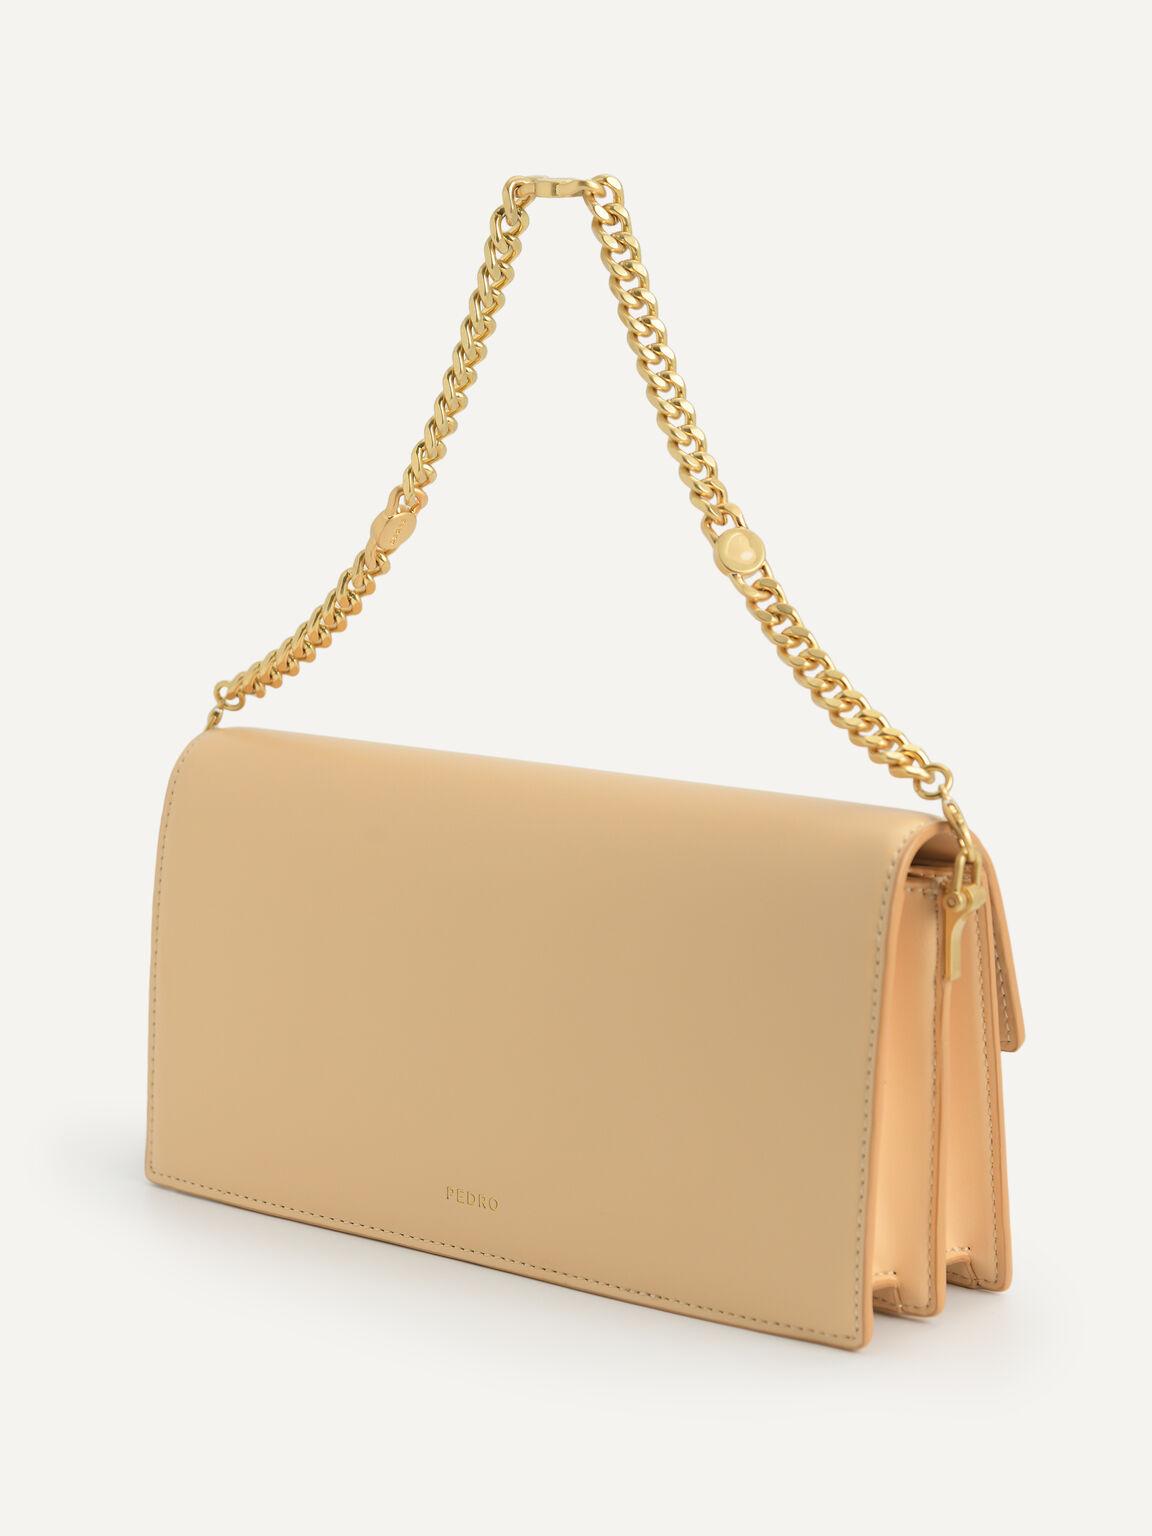 Shoulder Bag with Heart Clasp, Nude, hi-res